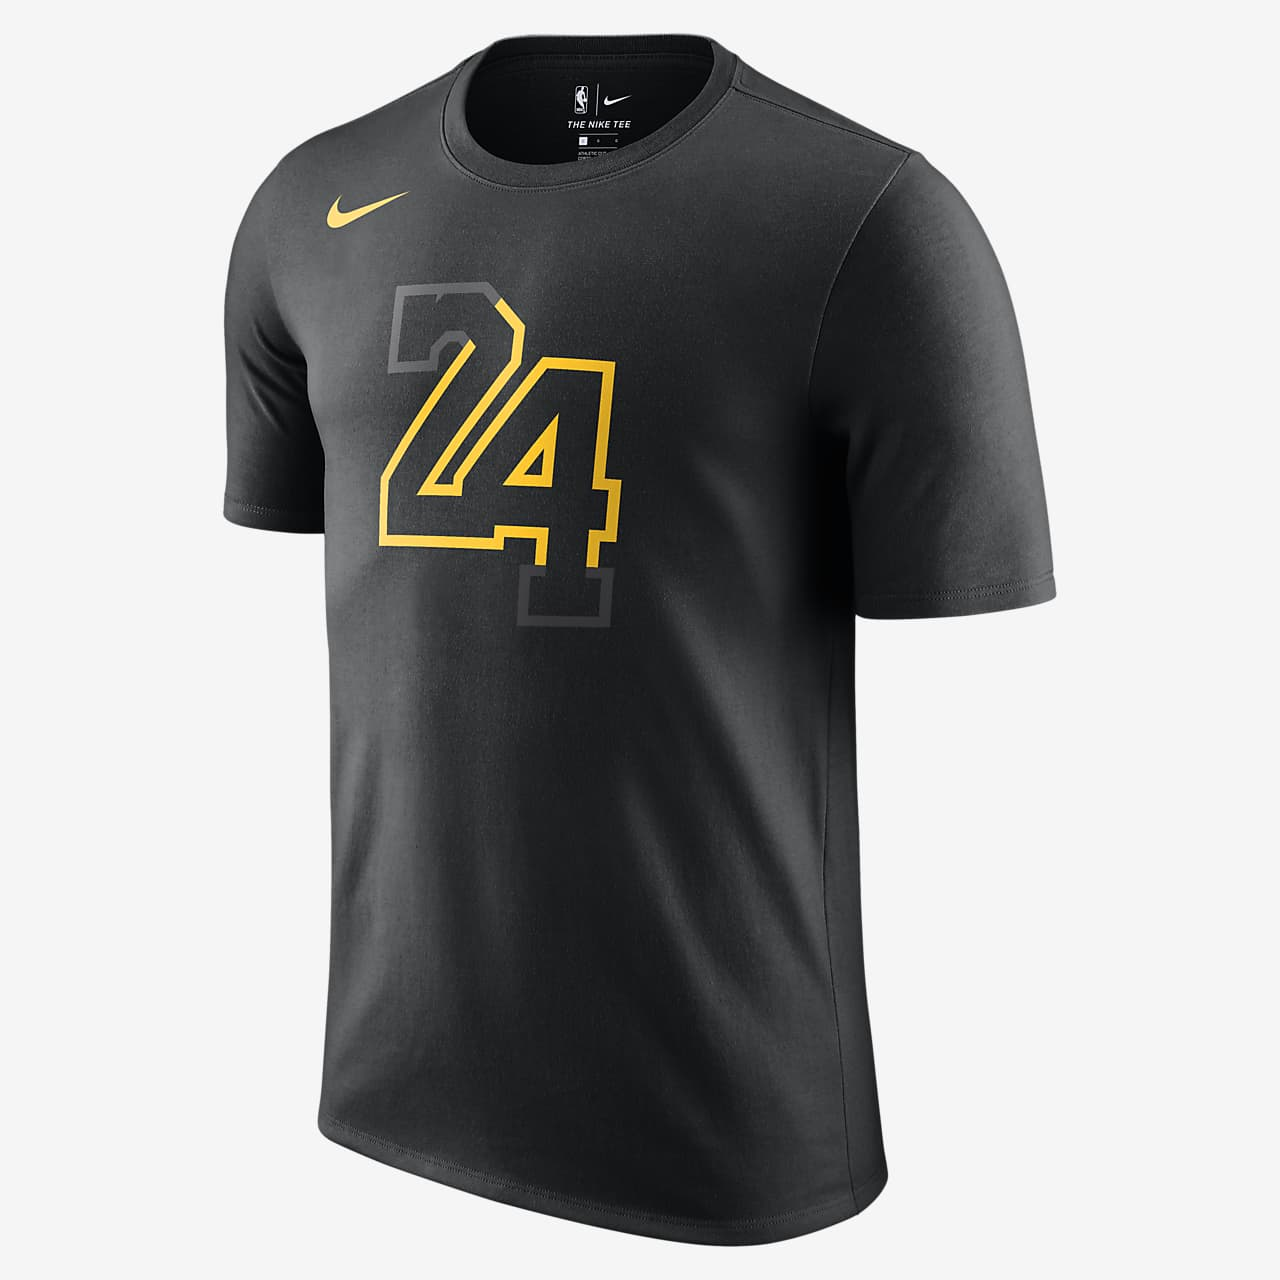 Nike Dry (Los Angeles Lakers) Men's Basketball T-Shirt